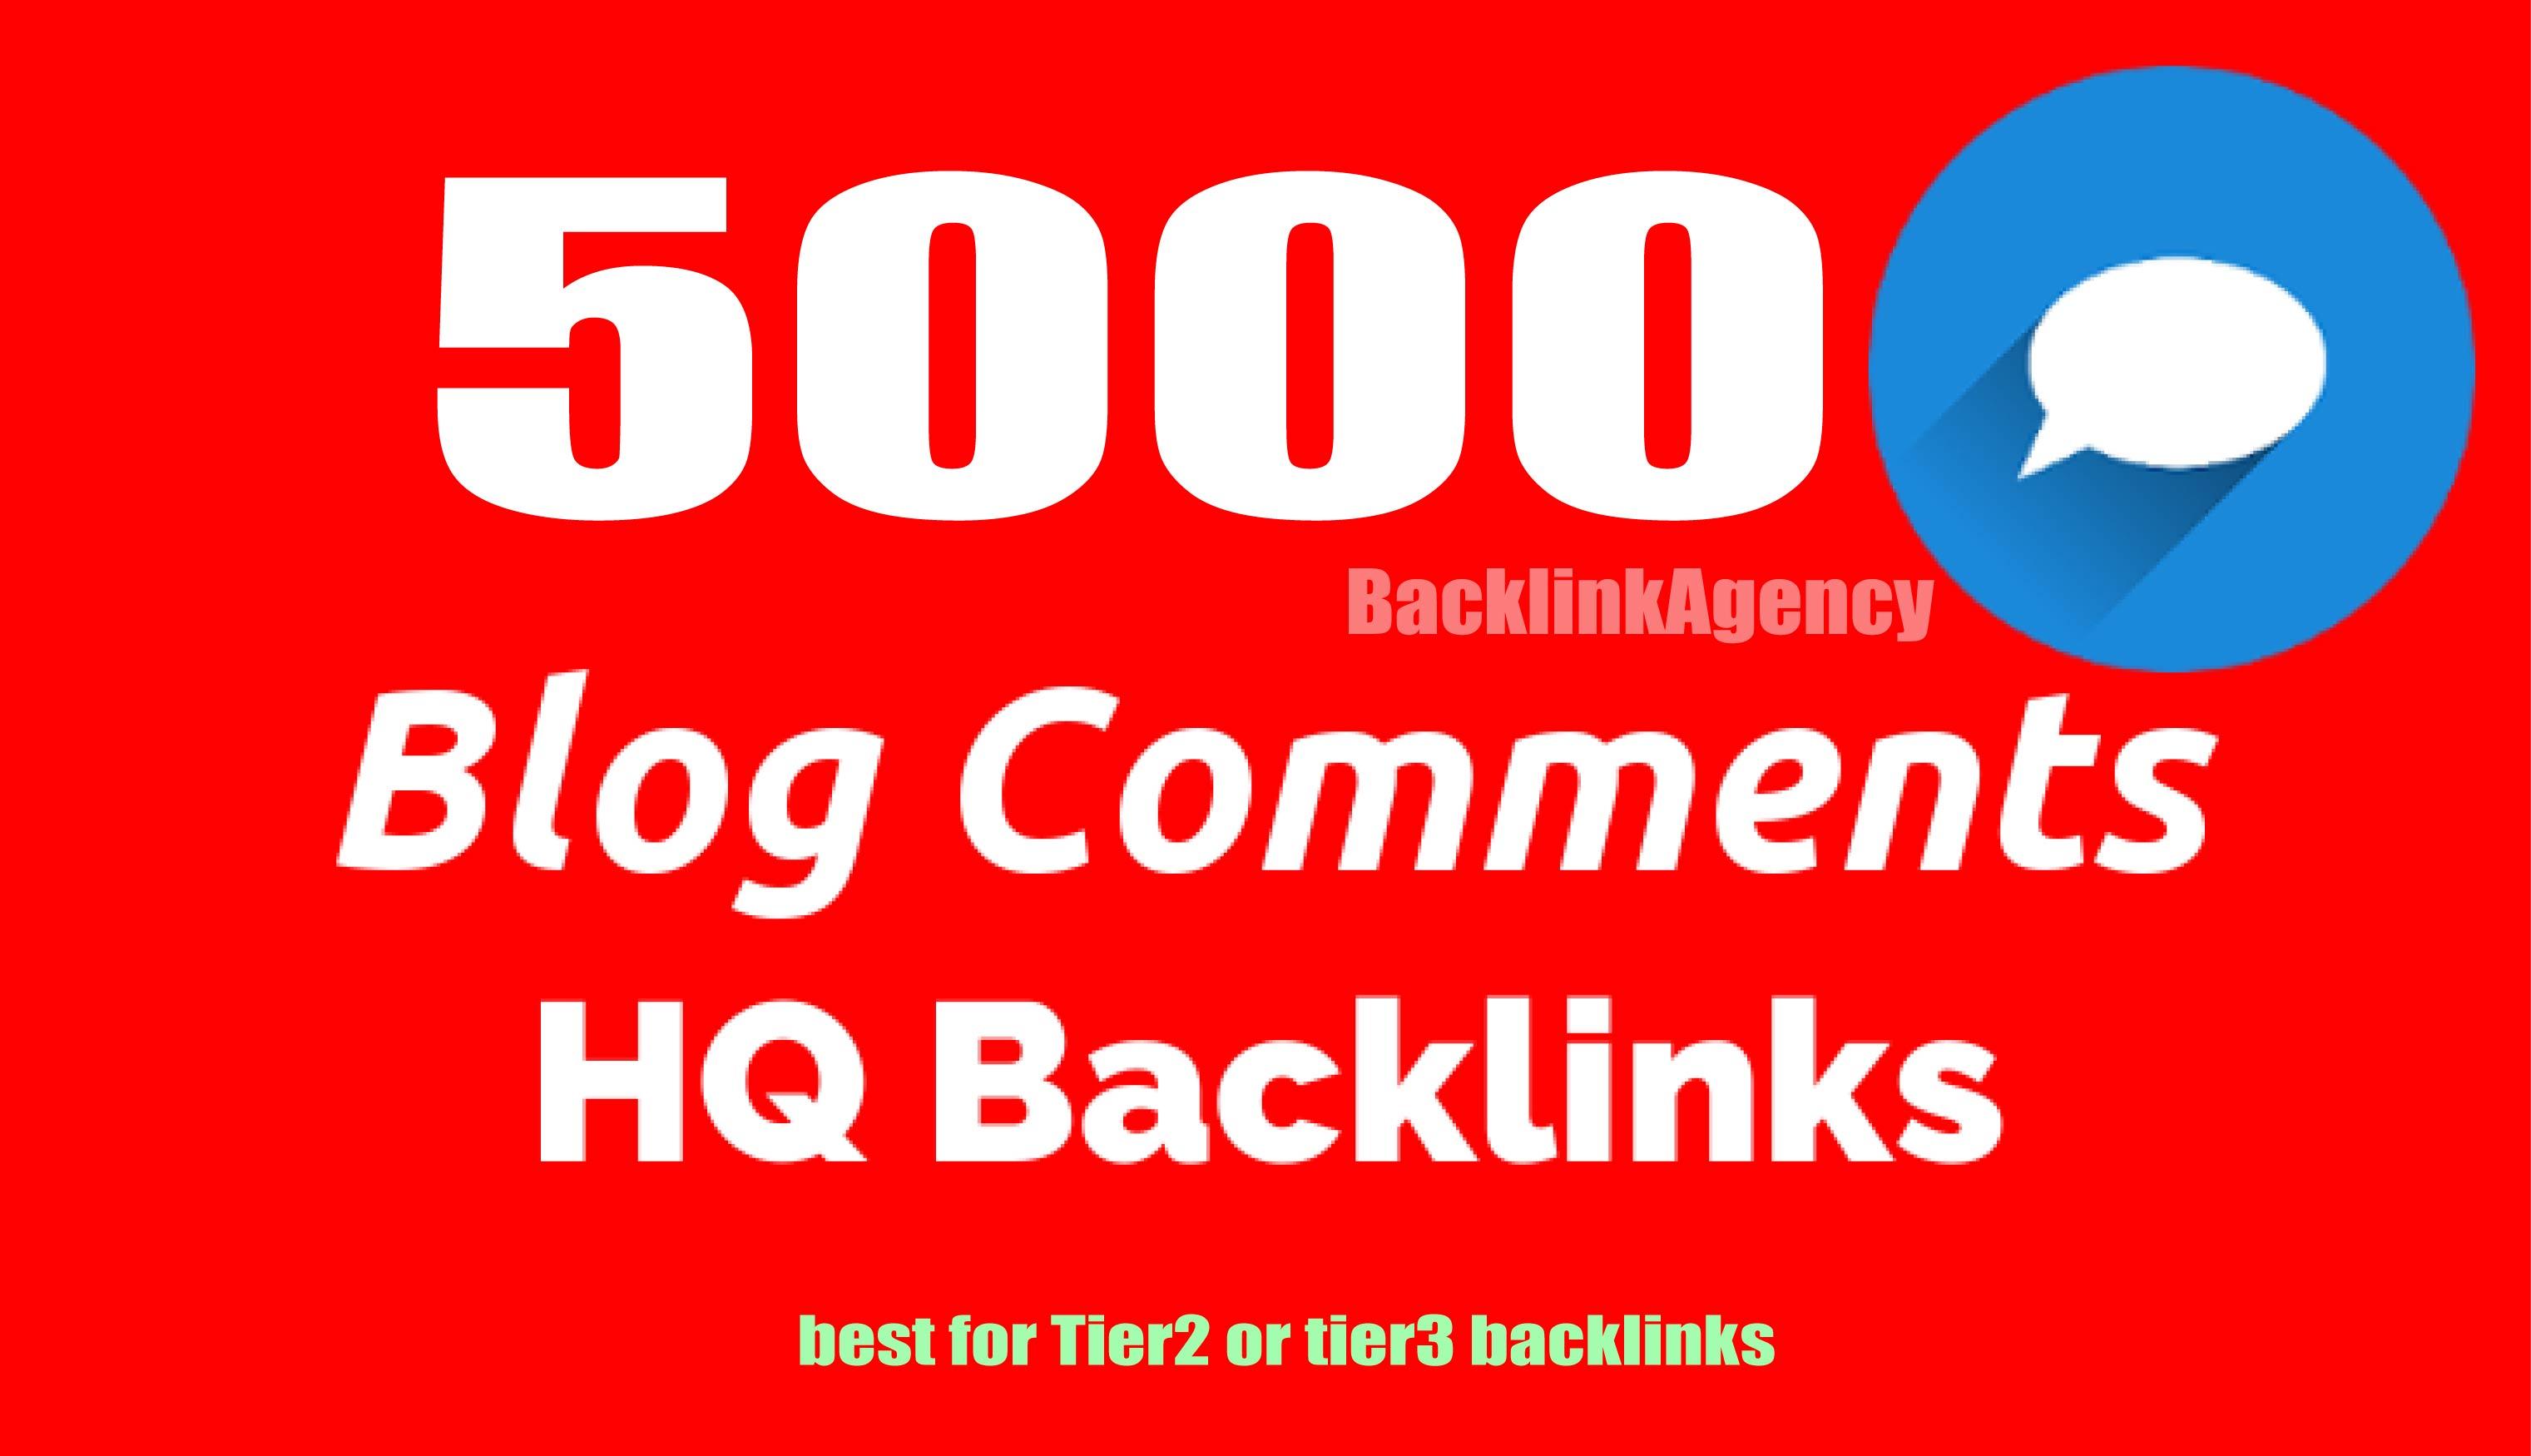 5000 blog comments HQ backlinks for SEO Rank Now,  Youtube,  Business,  website, blog,  social media etc.